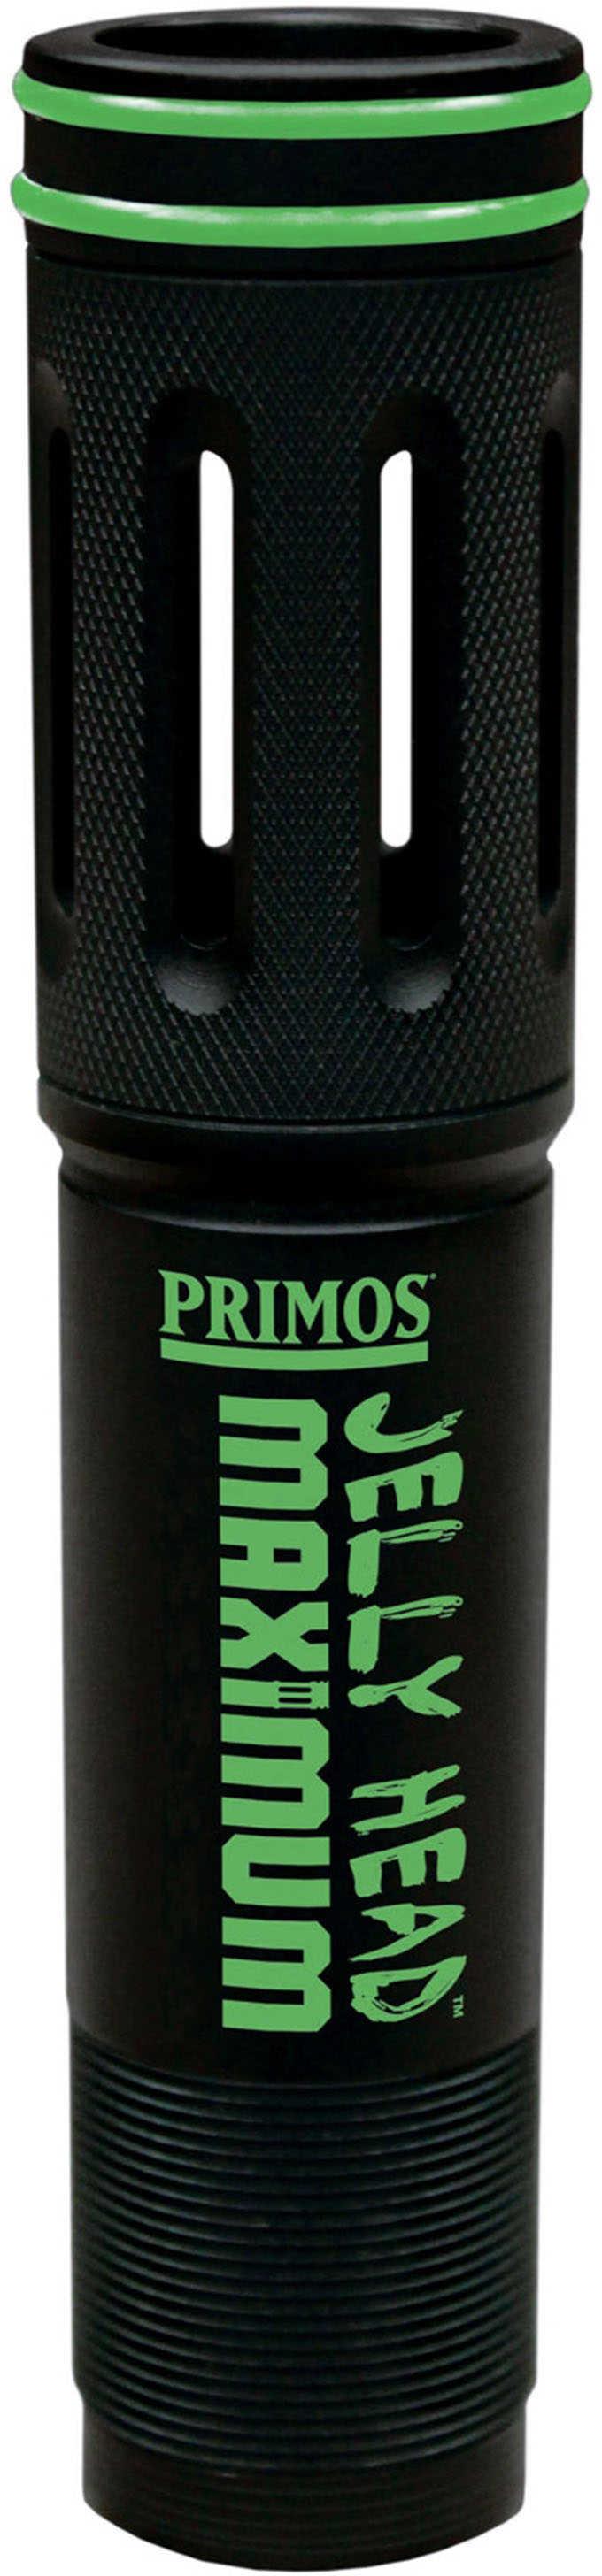 Primos 69402 Jelly Head Maximum Benelli/Beretta 12 Gauge Extended Turkey Choke Black